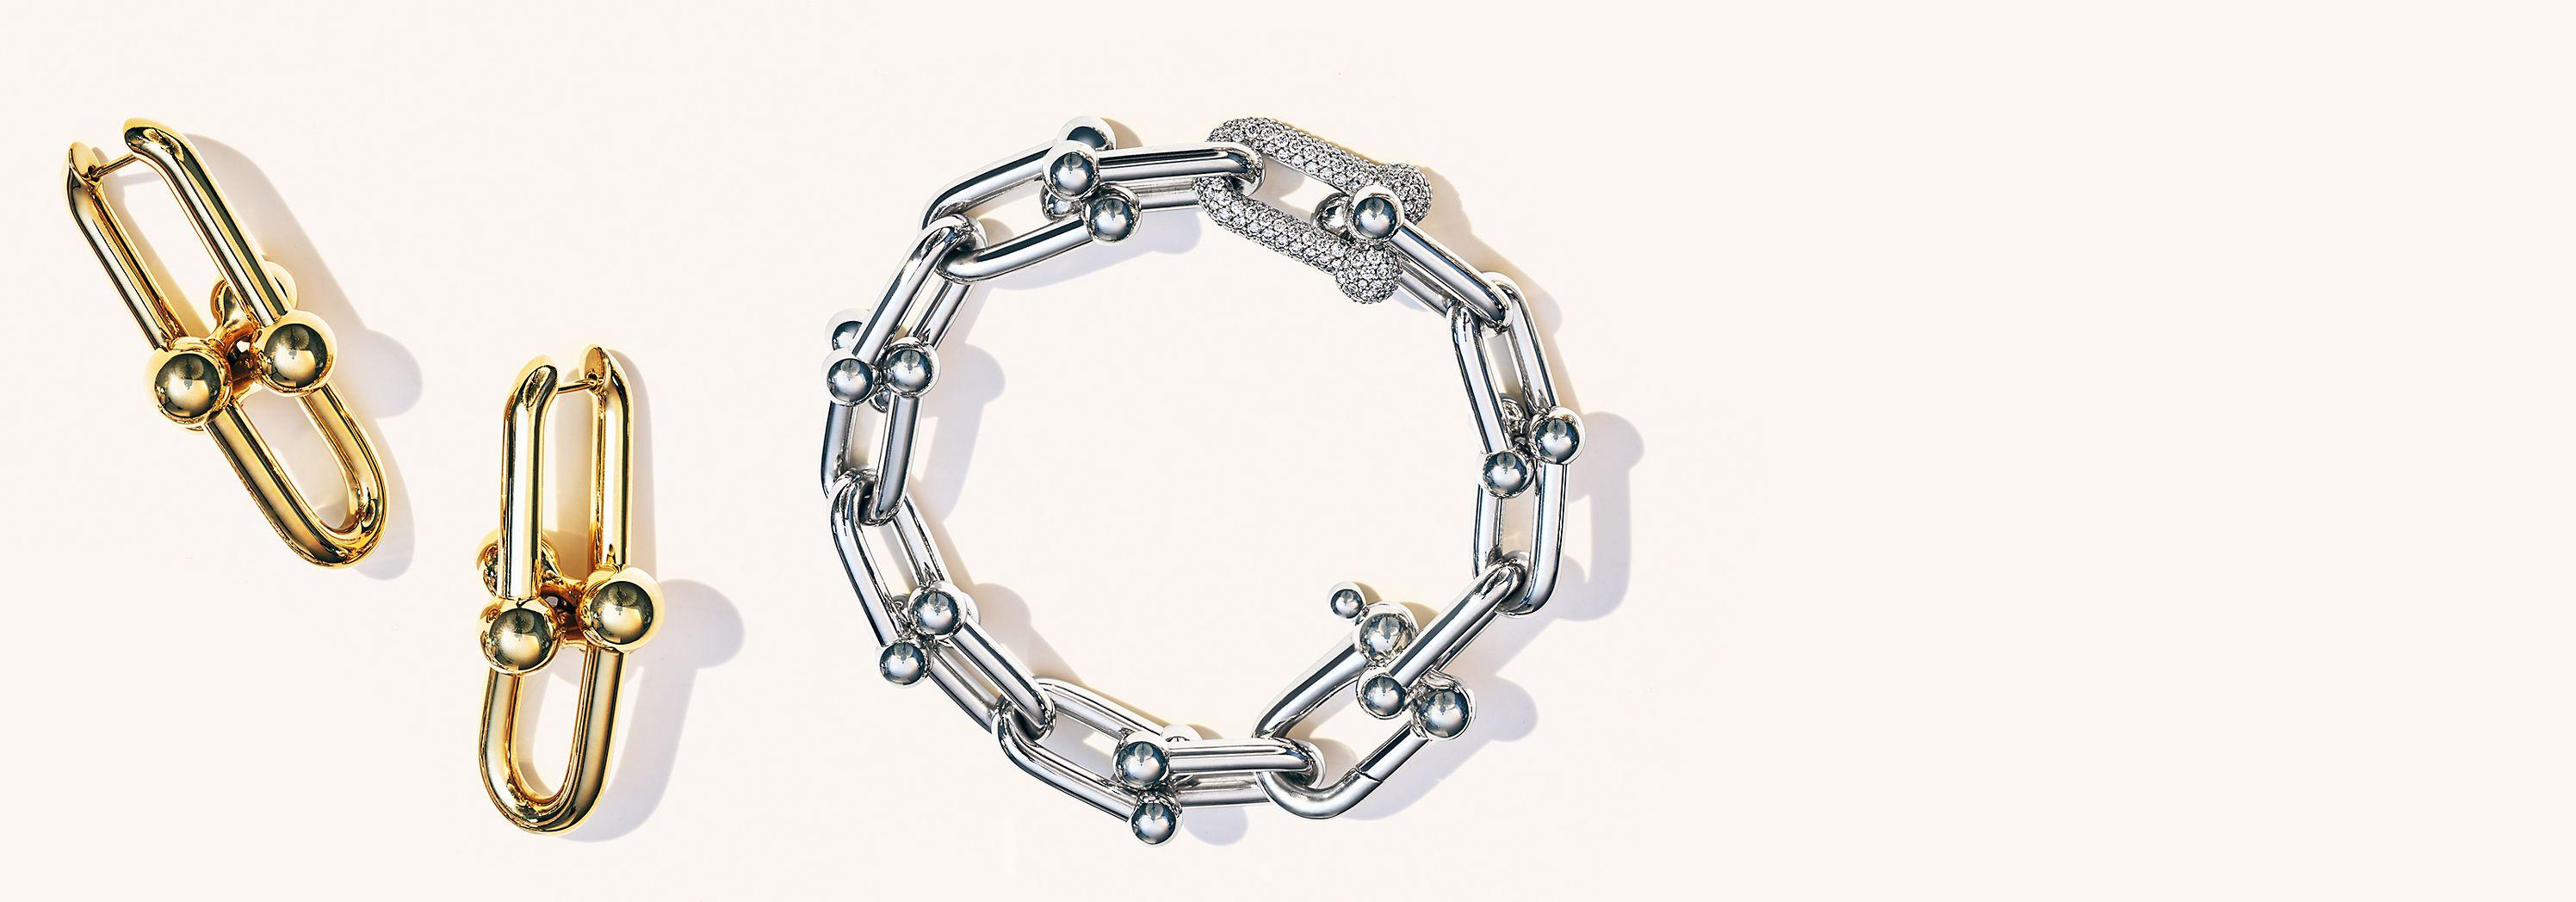 Shop the Tiffany HardWear collection